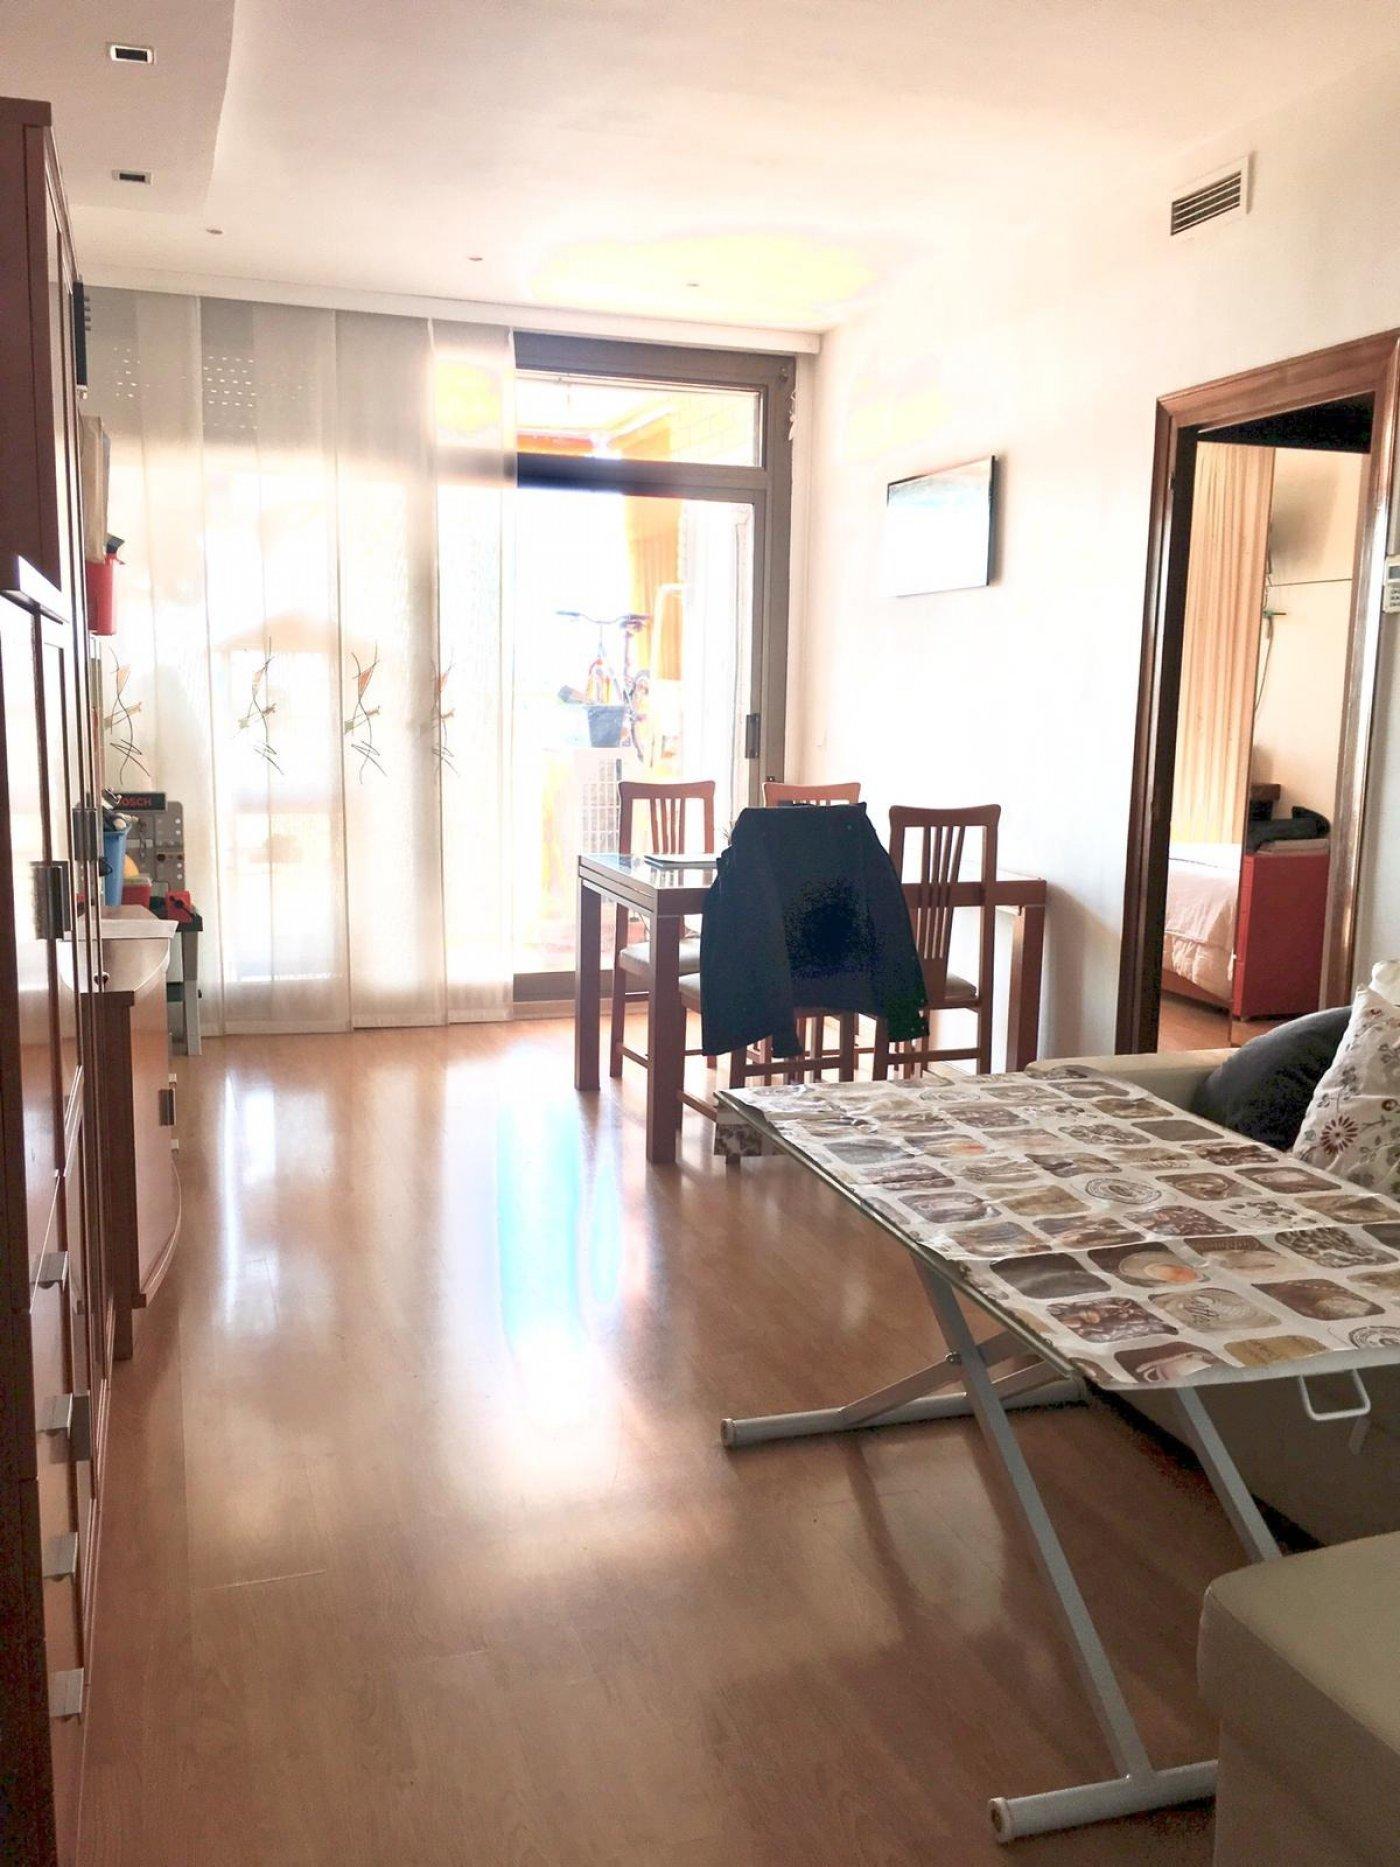 Piso en venta en Hospitalet de Llobregat